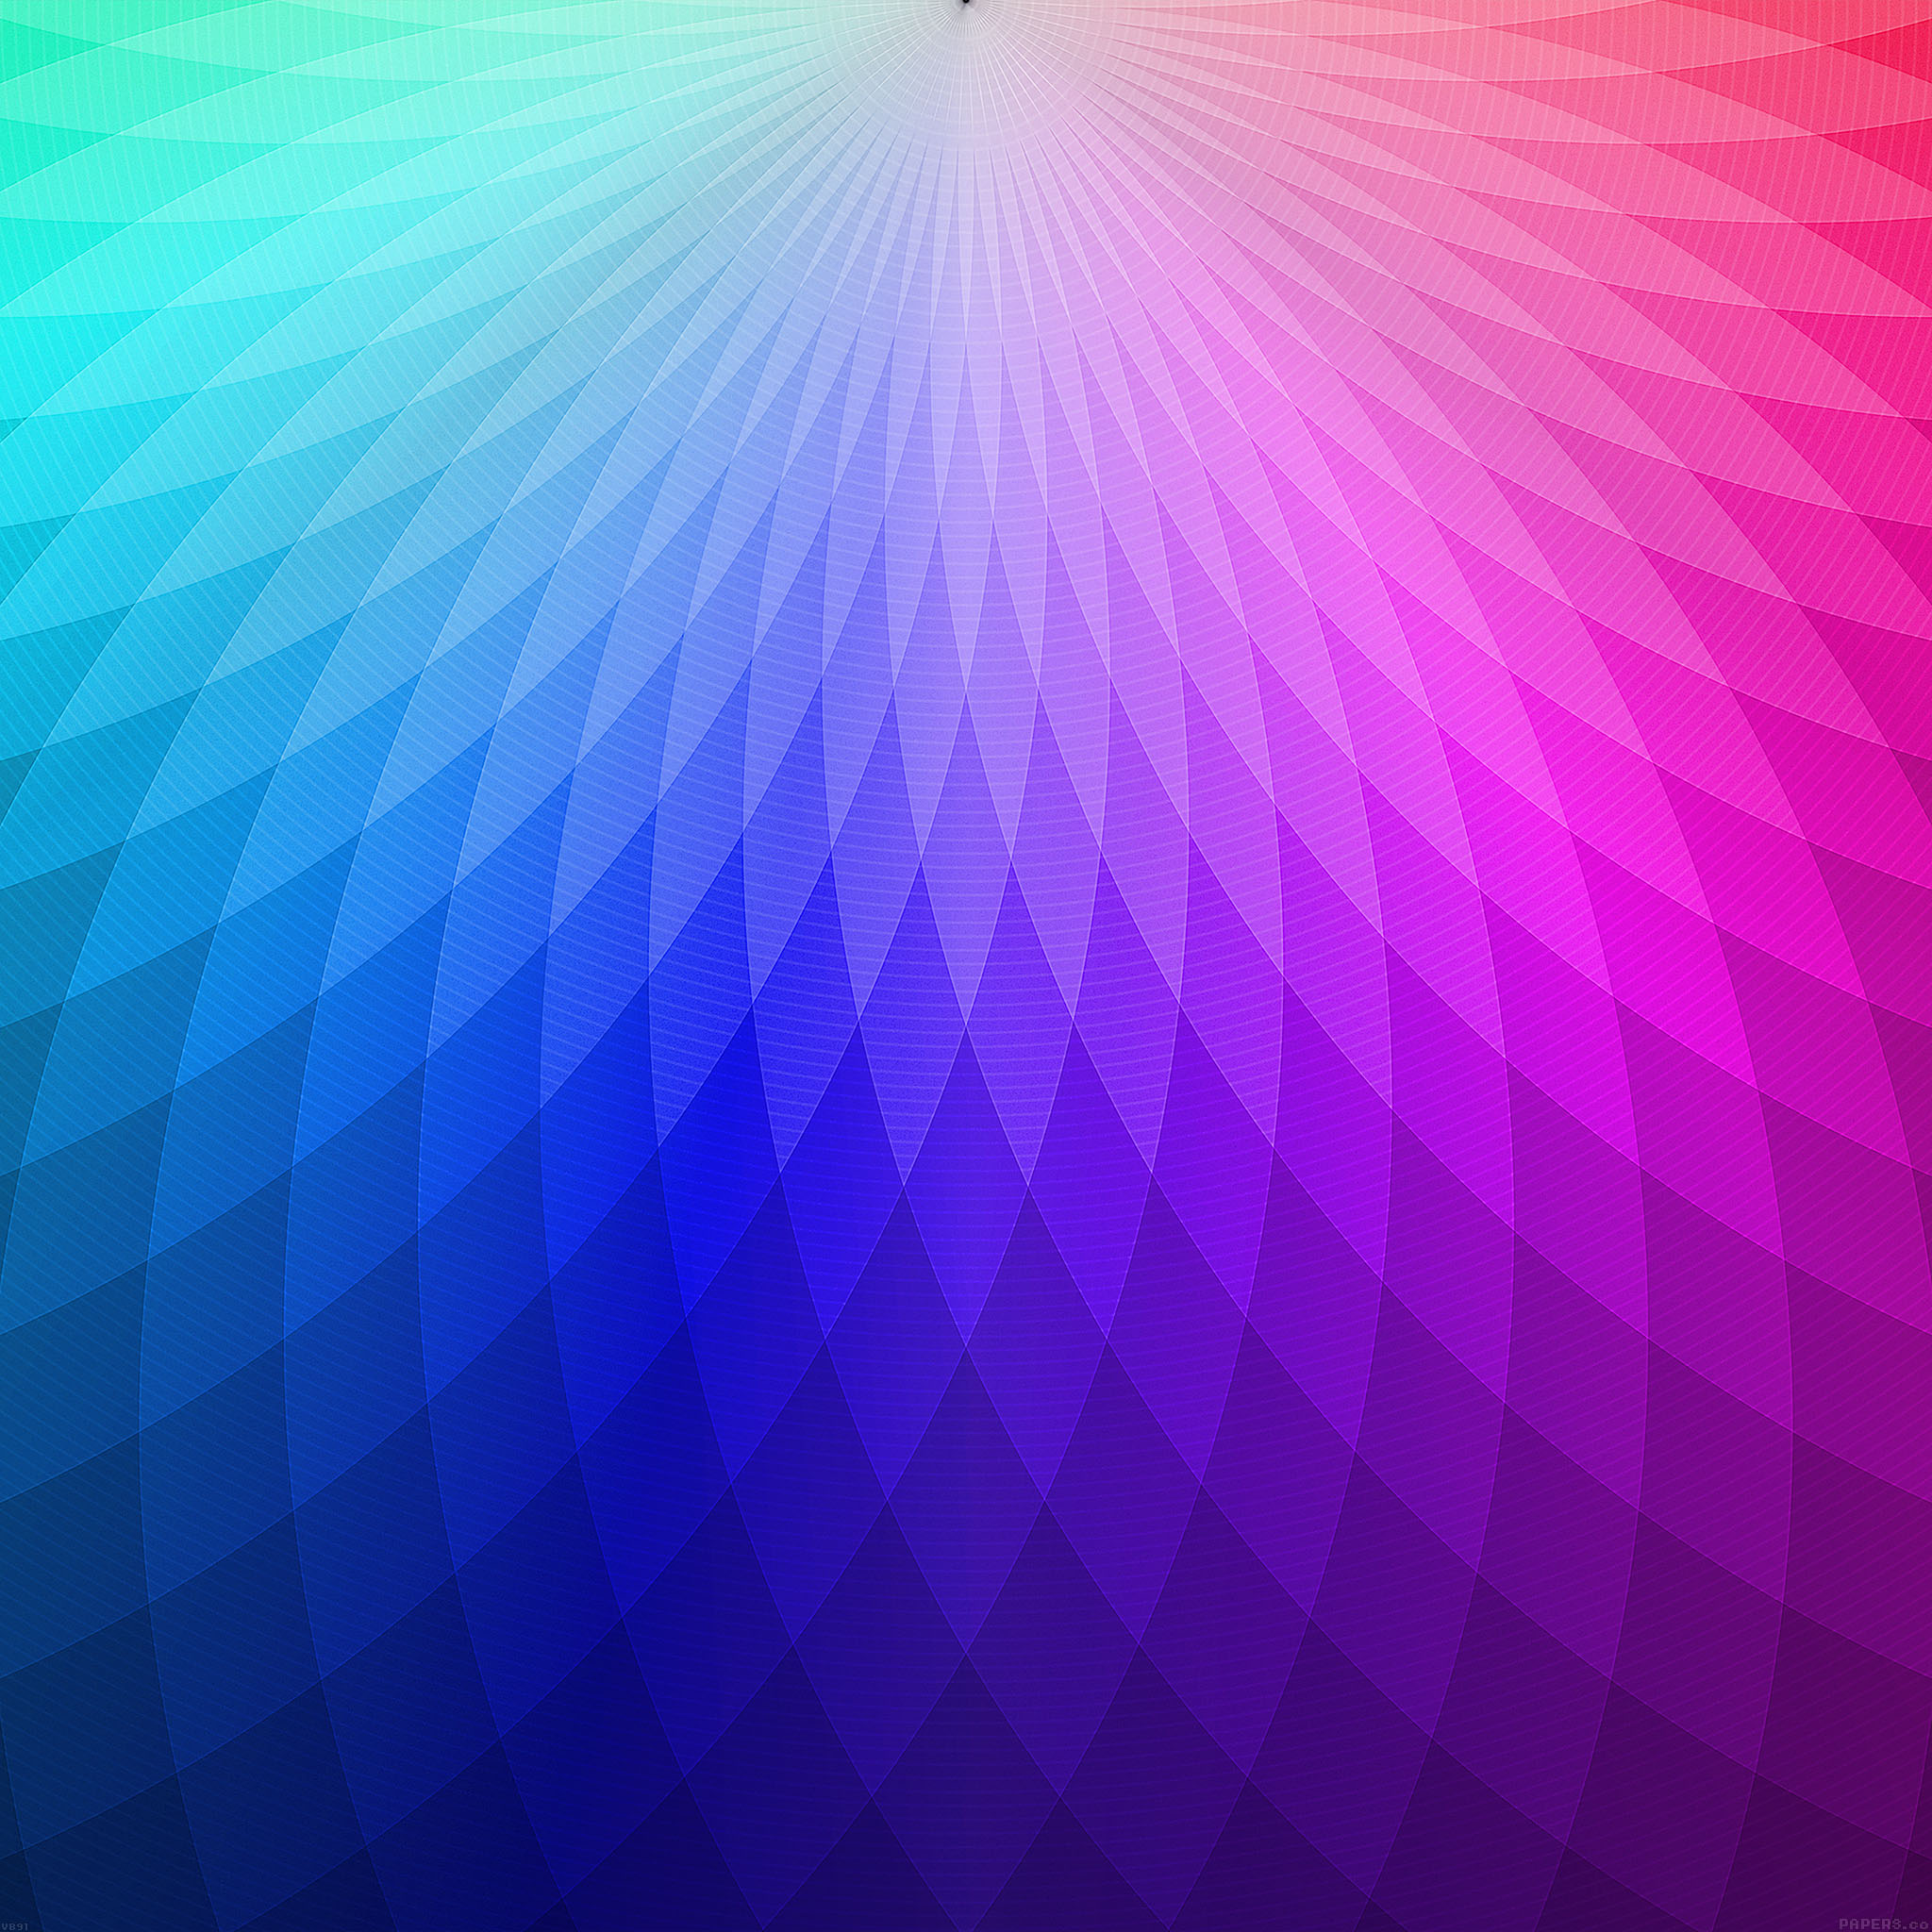 vb91 wallpaper rainbow lights patterns art